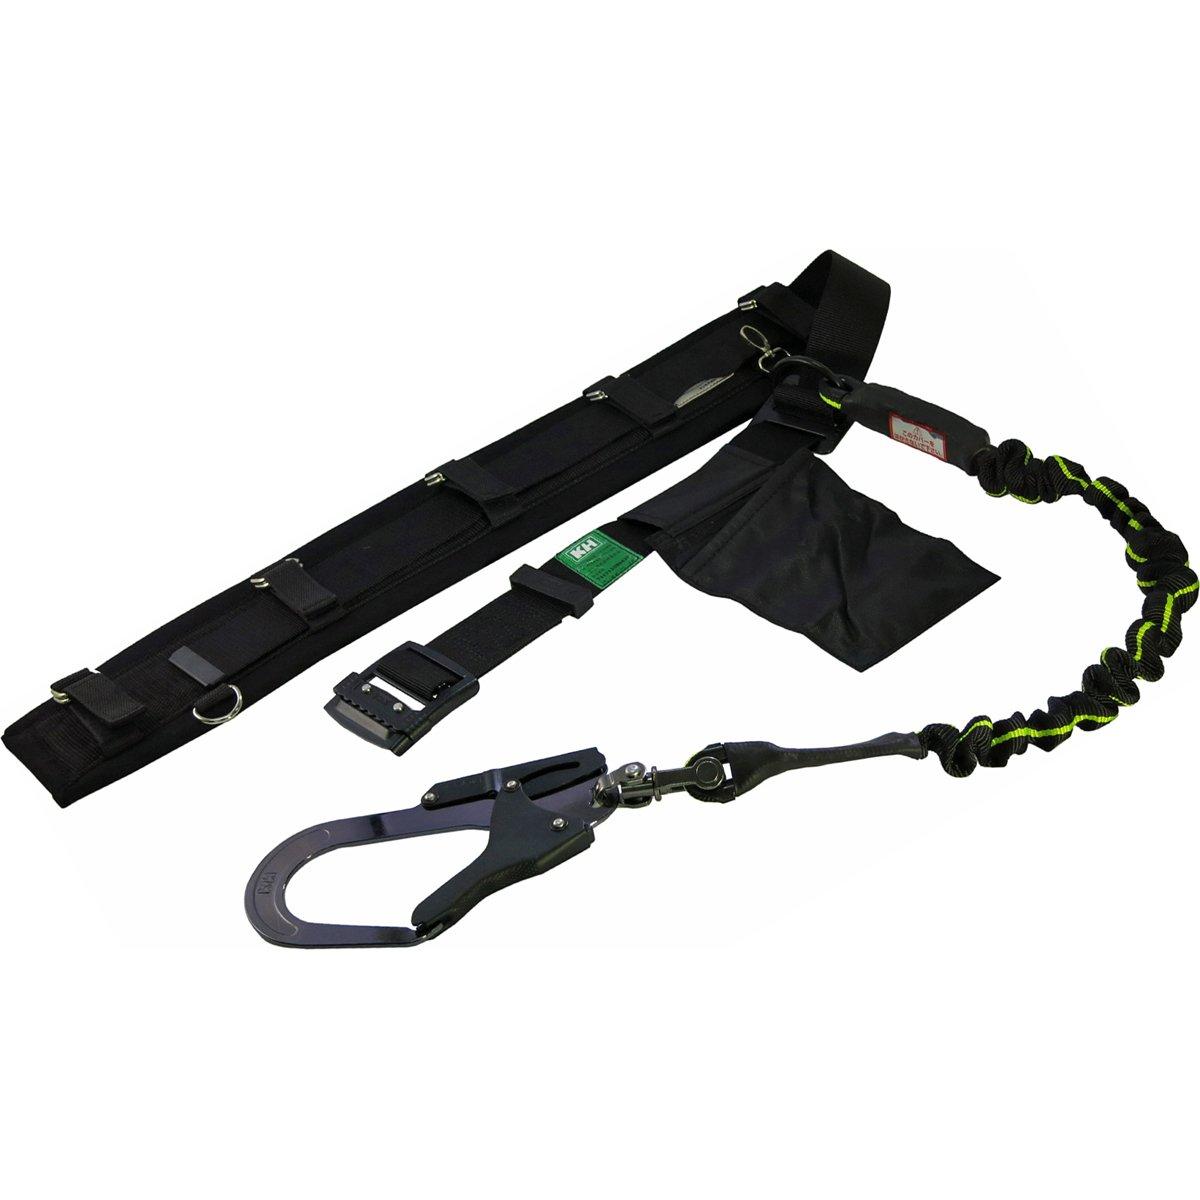 KH 安全帯 ロック式 タフアルミ アロッキー OD [落下防止 電気工事 高所での安全作業] B00GU480MA OD OD